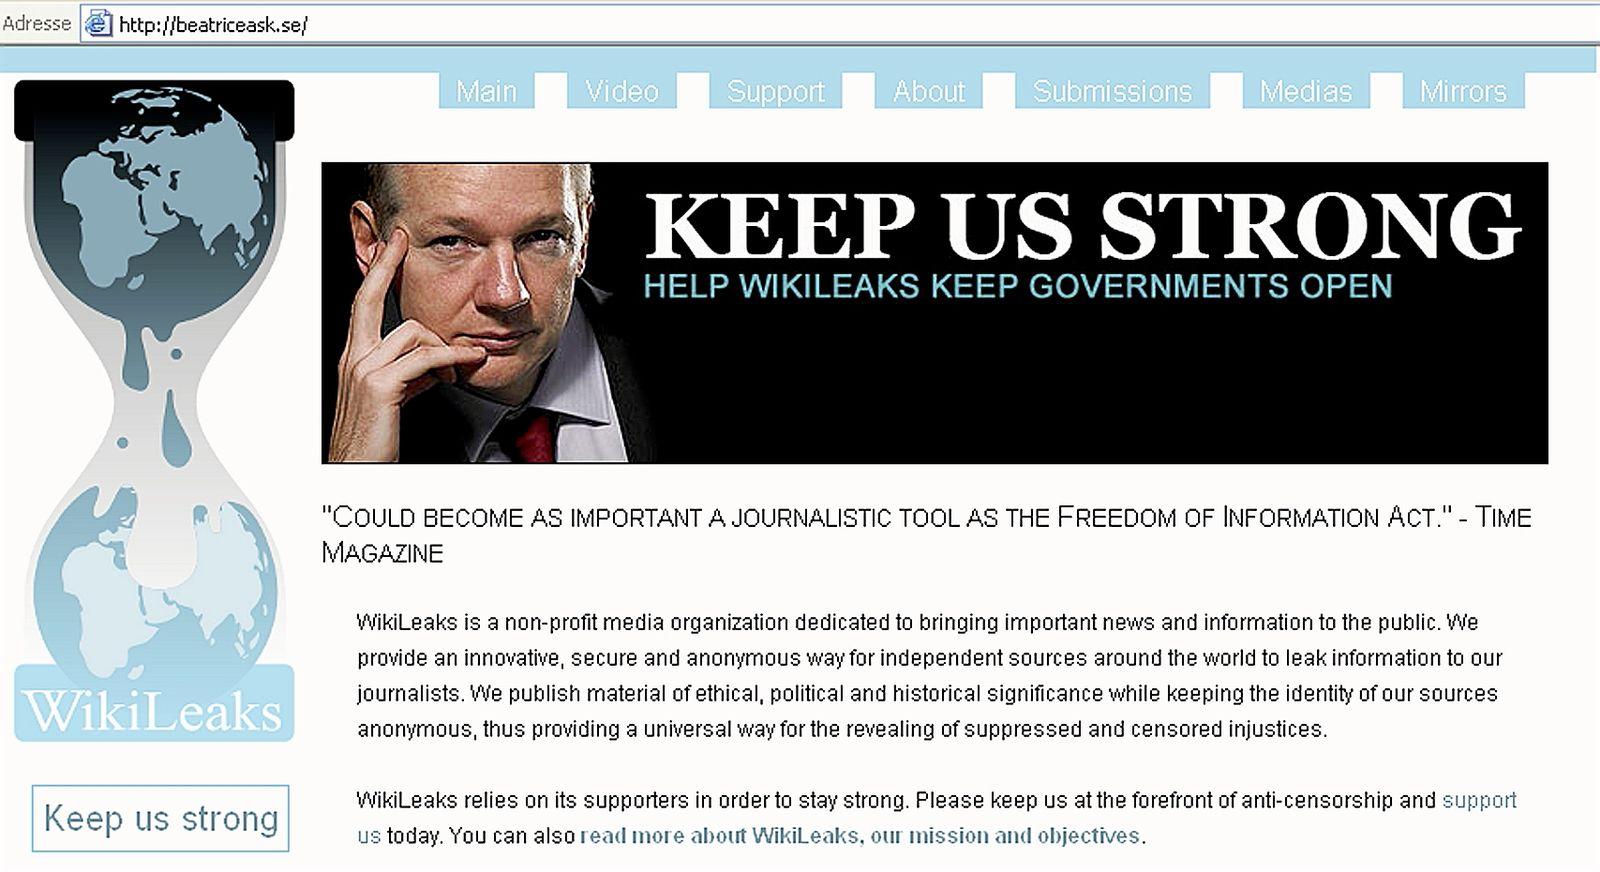 US-DIPLOMACY-WIKILEAKS-SWEDEN-JUSTICE-WEBSITE